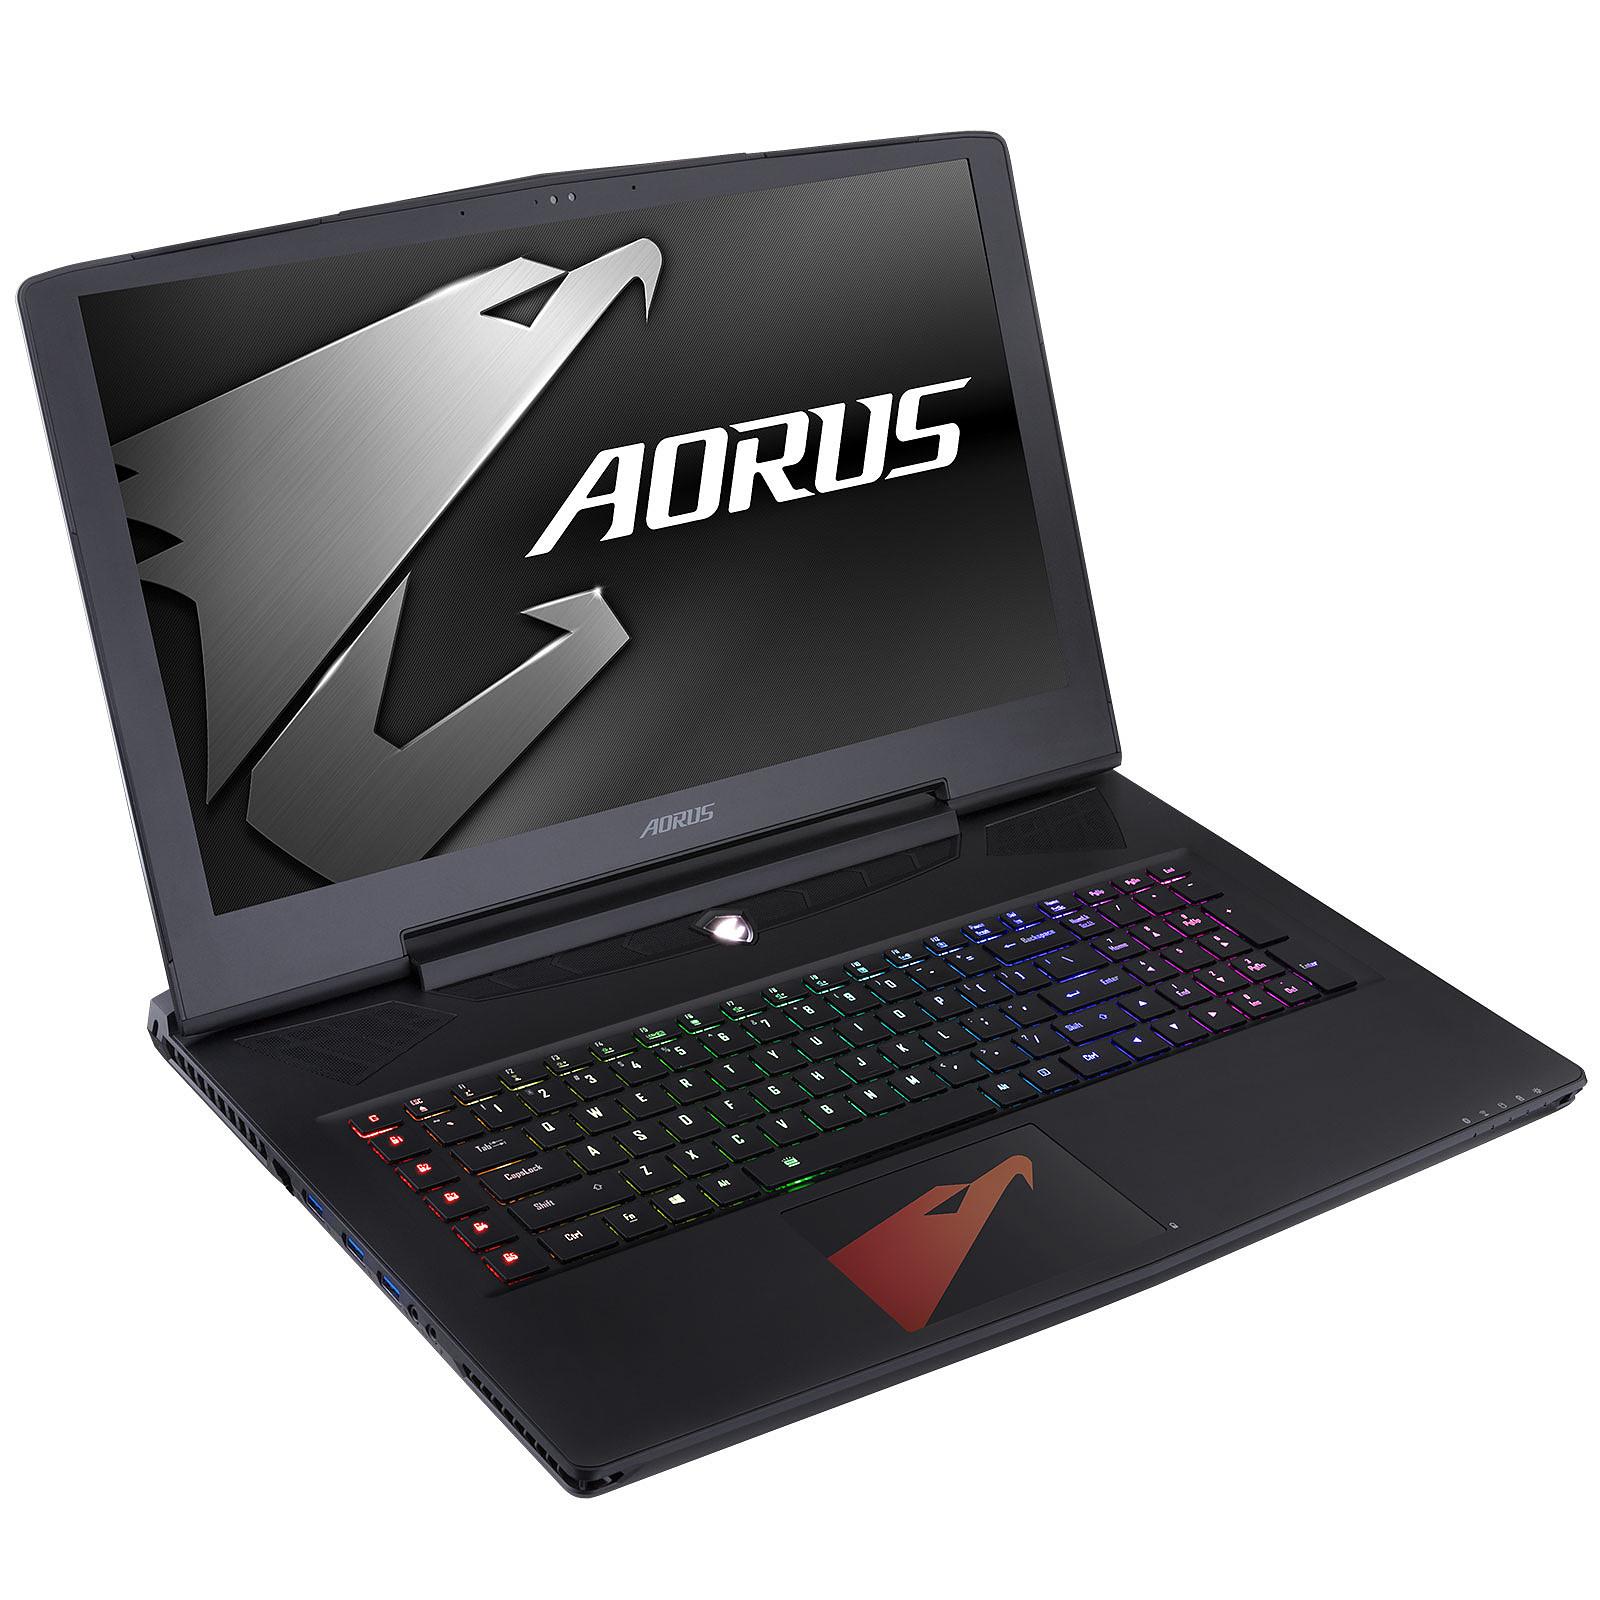 AORUS X7 DT v7 K220NW10-FR · Occasion